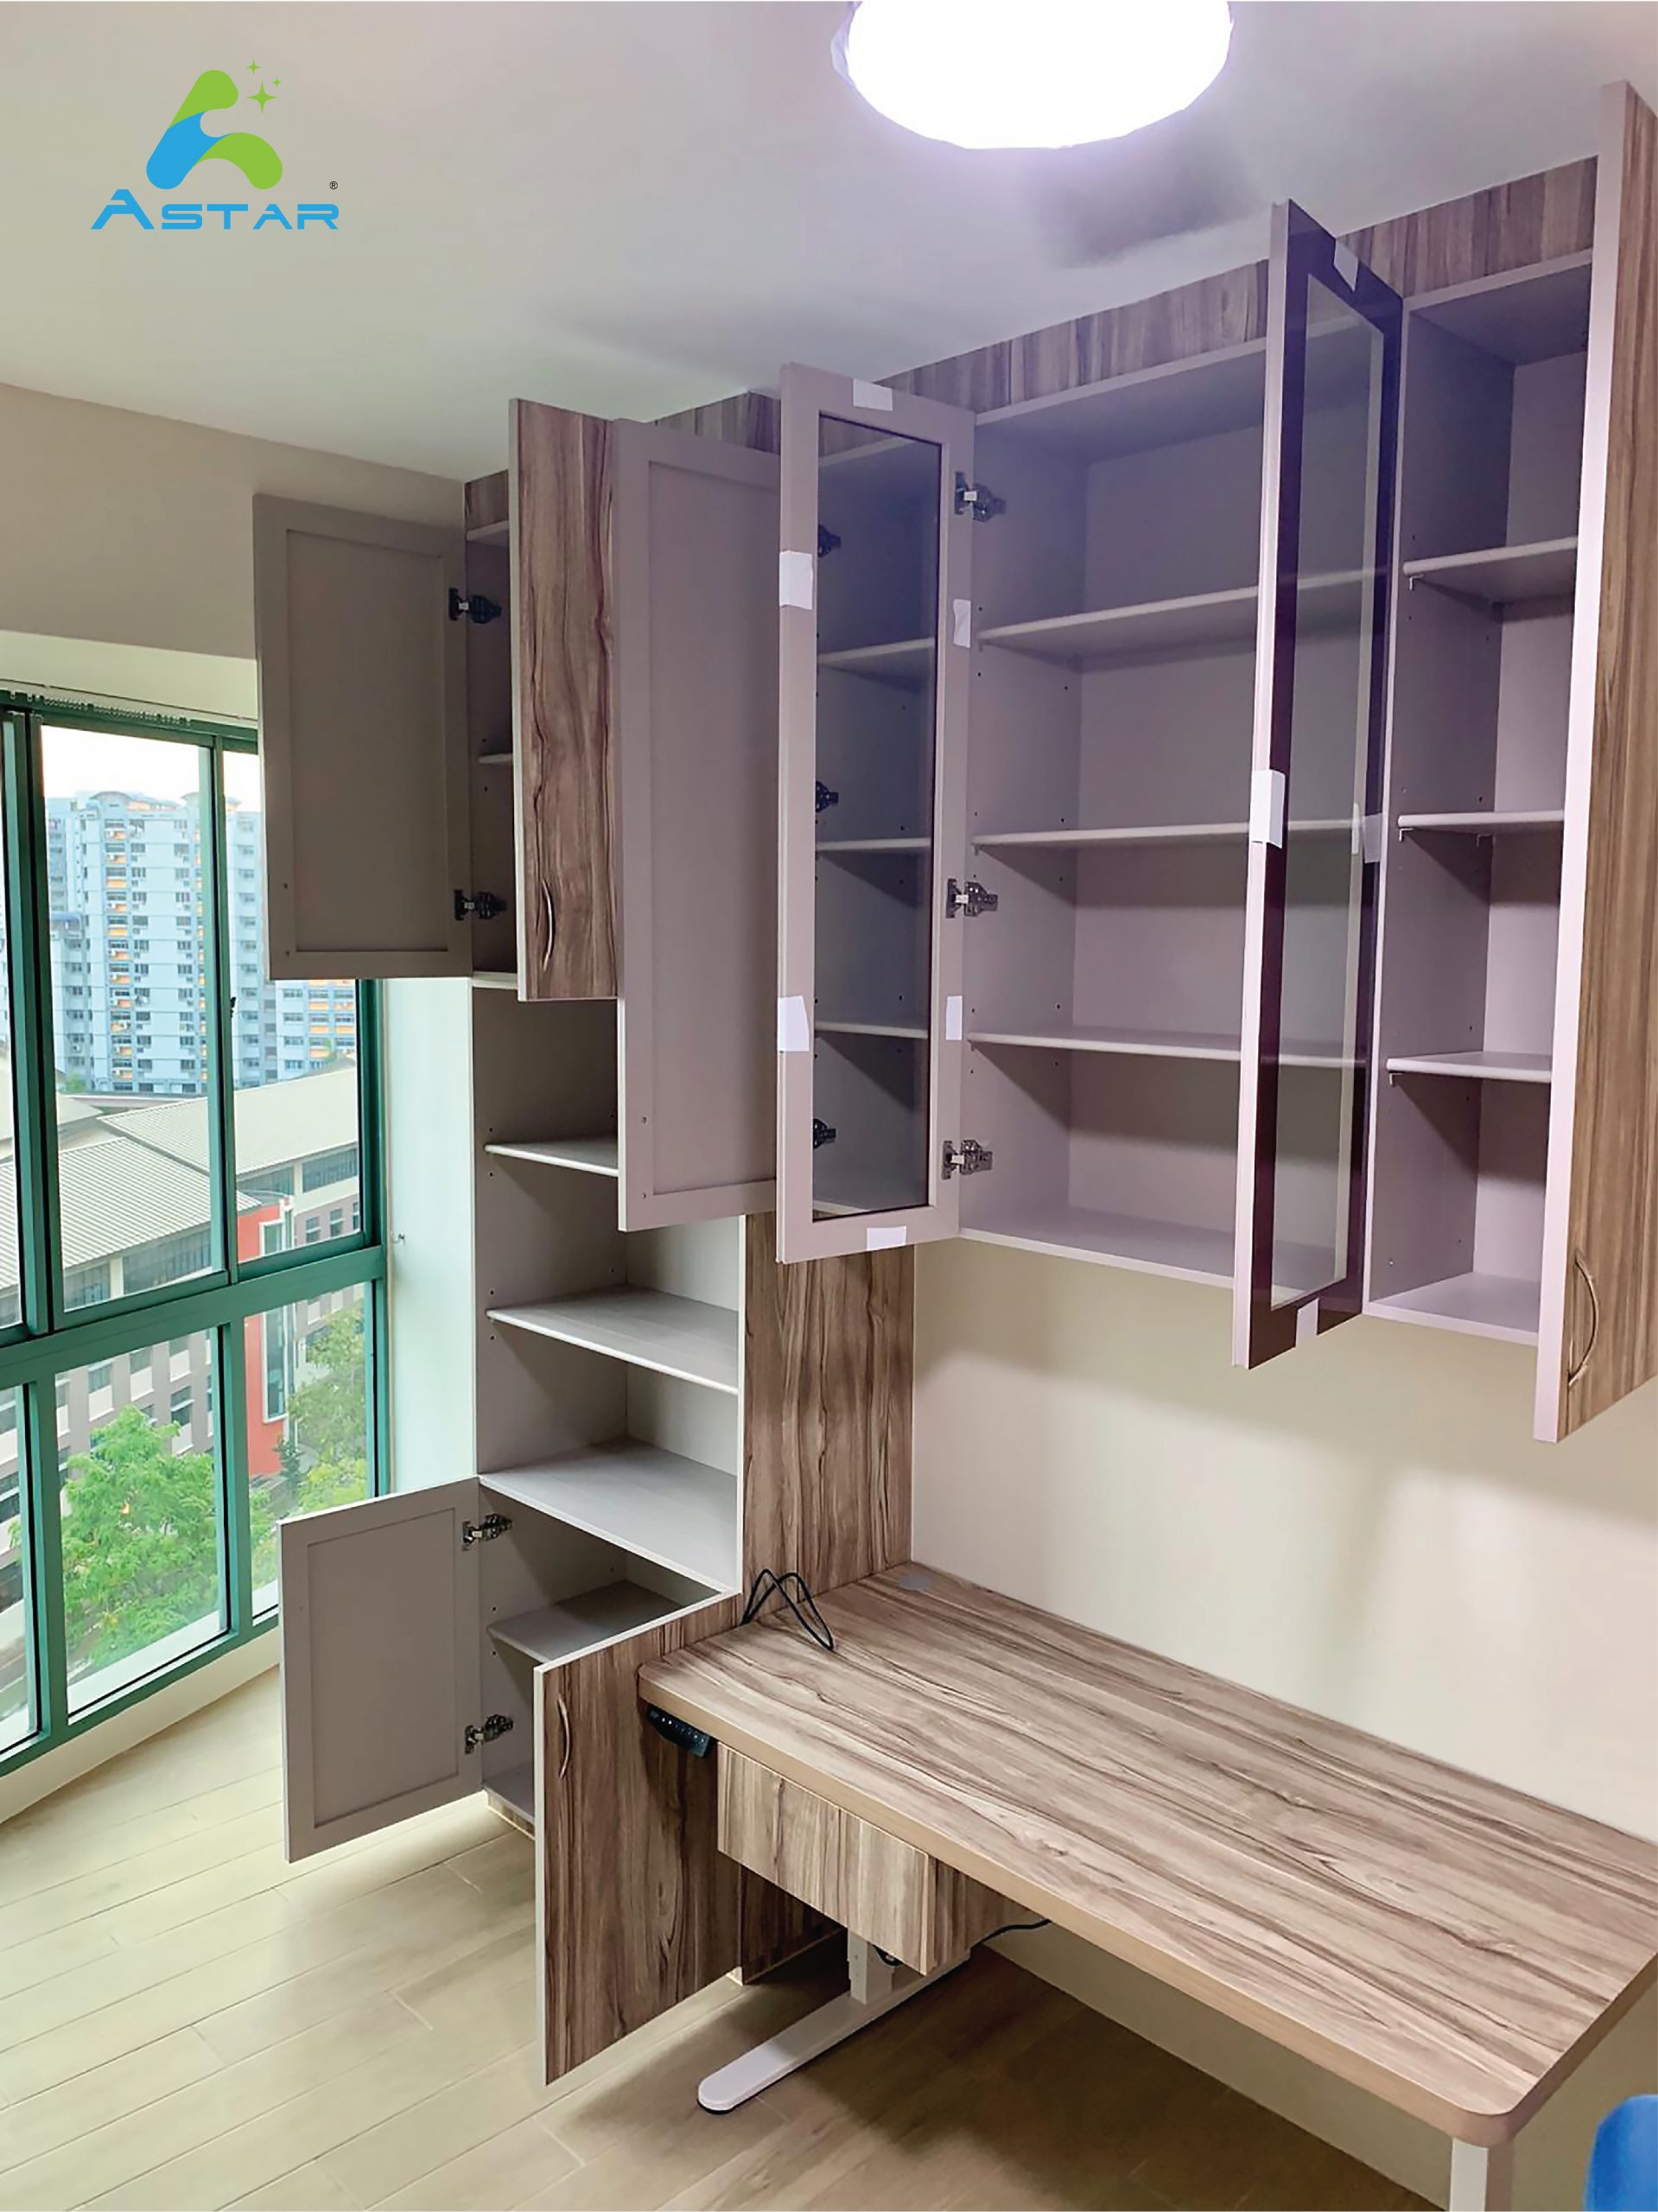 astar furnishing aluminum furniture projects Yew Mei Green Condominium 11